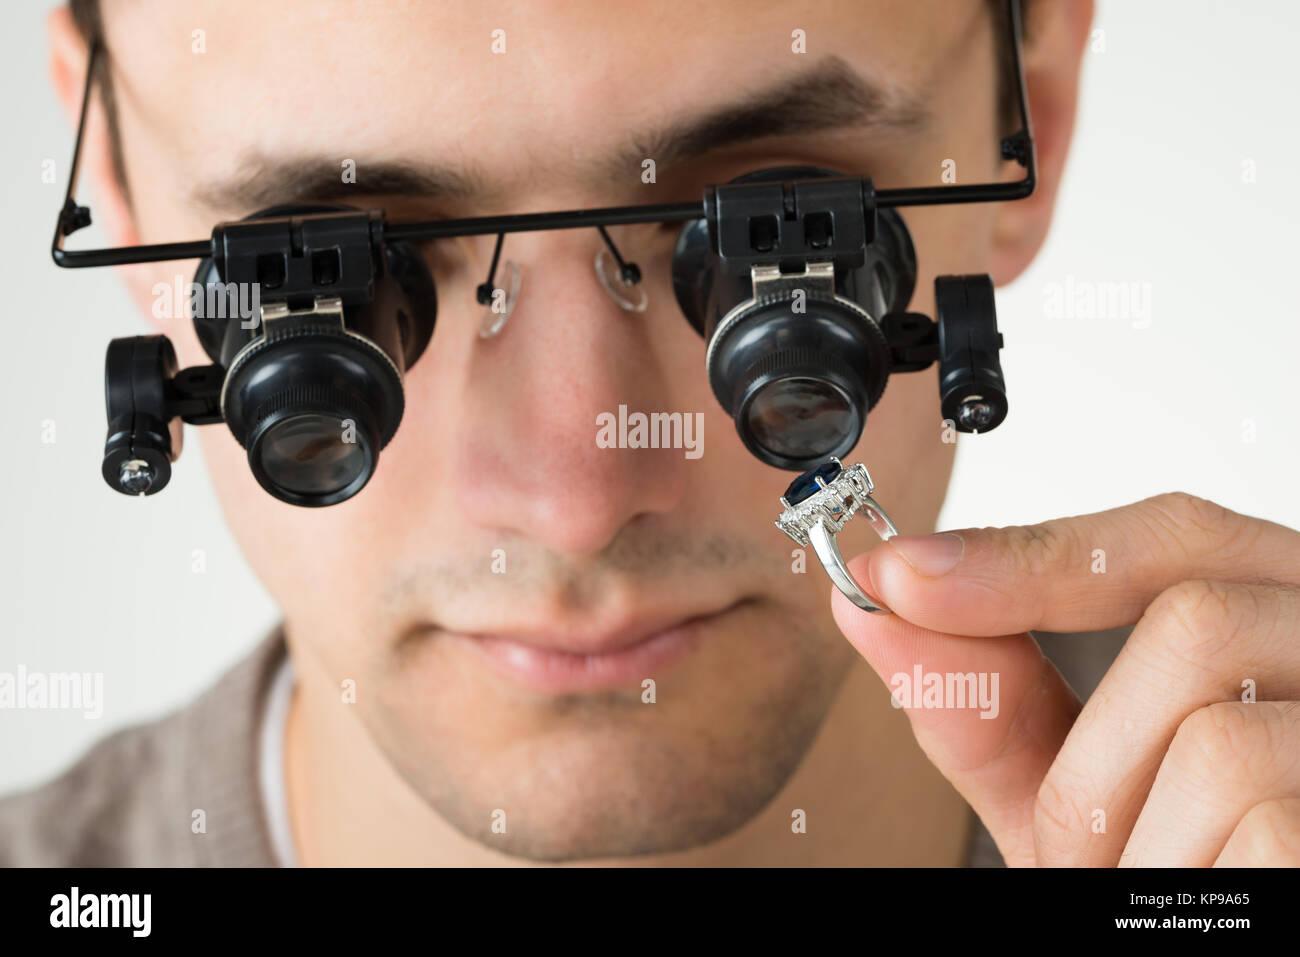 Jeweler Examining Diamond Ring With Magnifying Loupe Stock Photo